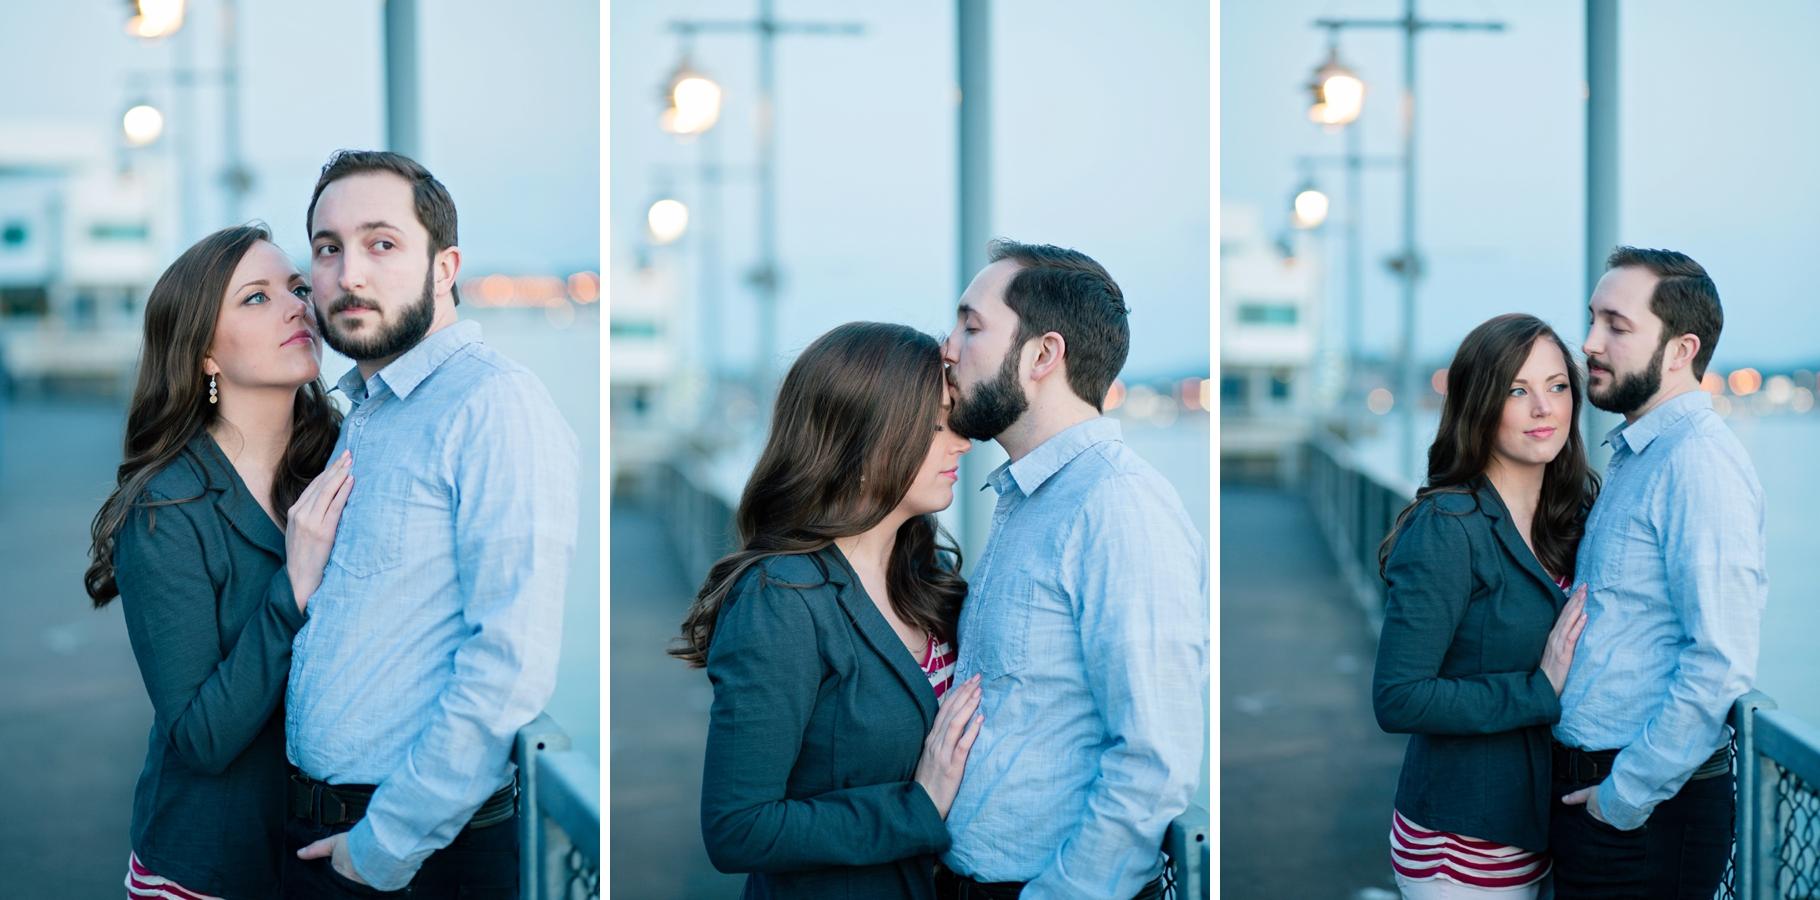 13-Melinda-Tom-Engaged-Seattle-Downtown-Waterfront-Romantic-twilight-boardwalk-cityscape-Enagement-Photographer-Wedding-Photography-by-Betty-Elaine